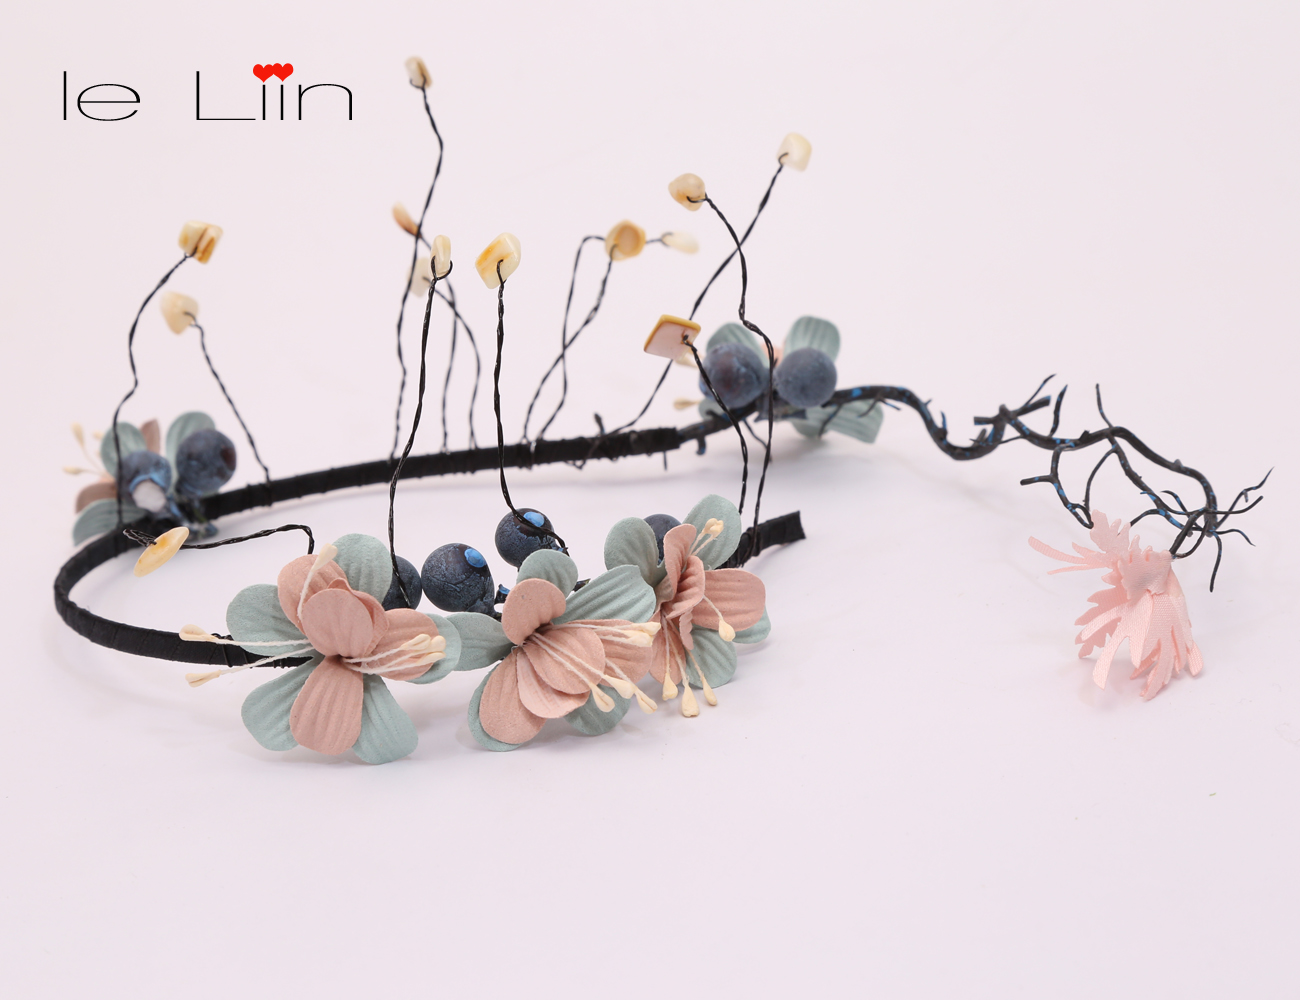 Le liin Blueberry headwreath Flower Crown Berry Wreath headband Rustic Tiara Romantic Berries Headband